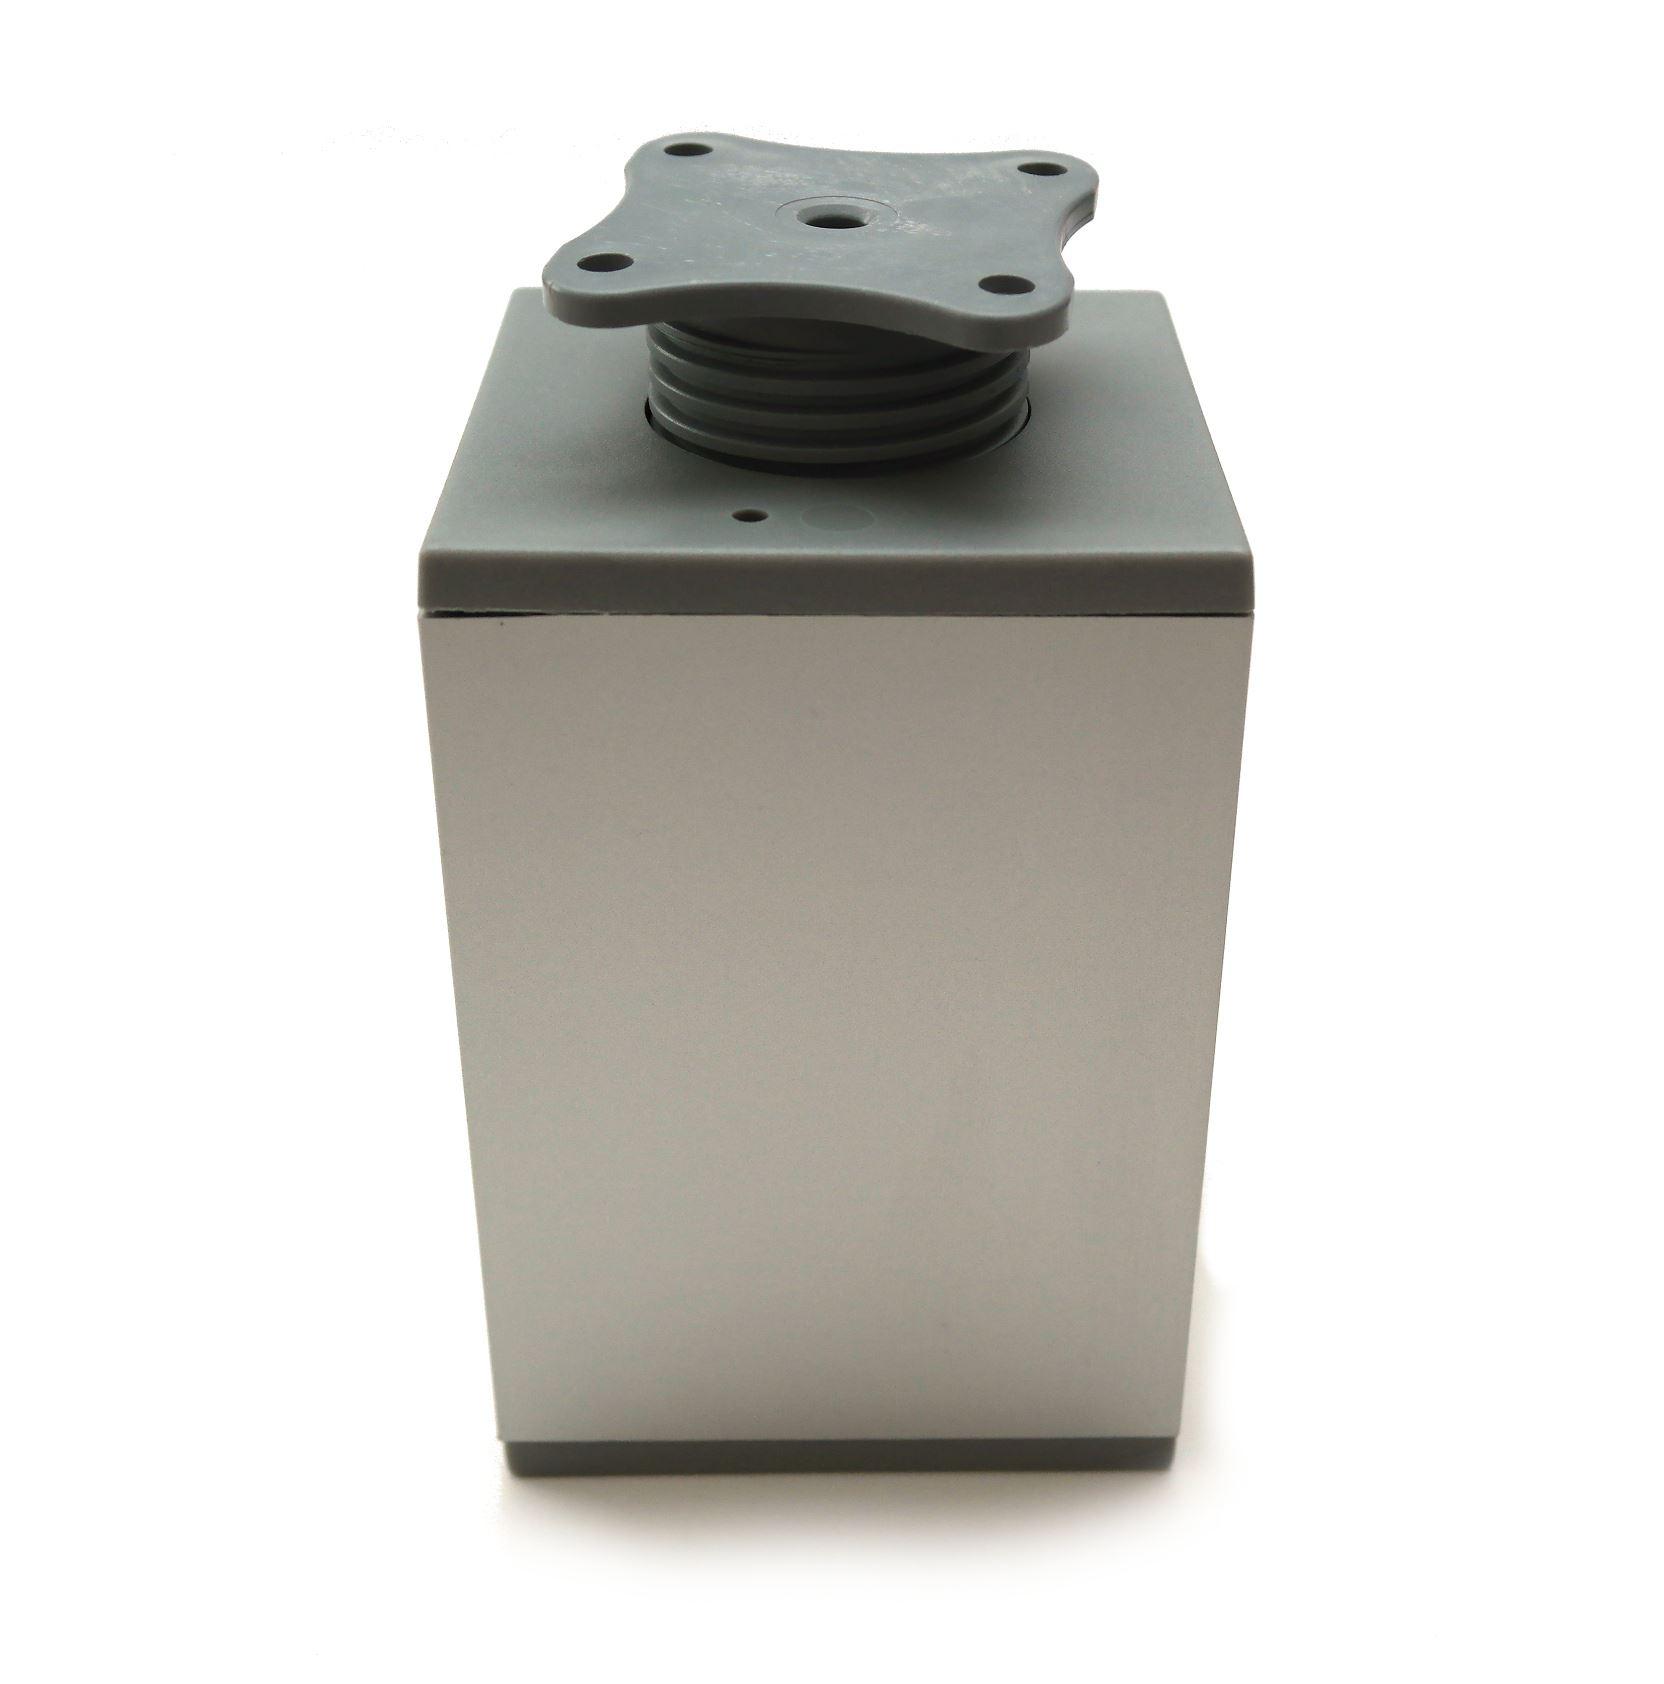 Aluminium f e beine schr nke k che m bel chrom 70mm 200mm ebay - Amazon mobel schranke ...